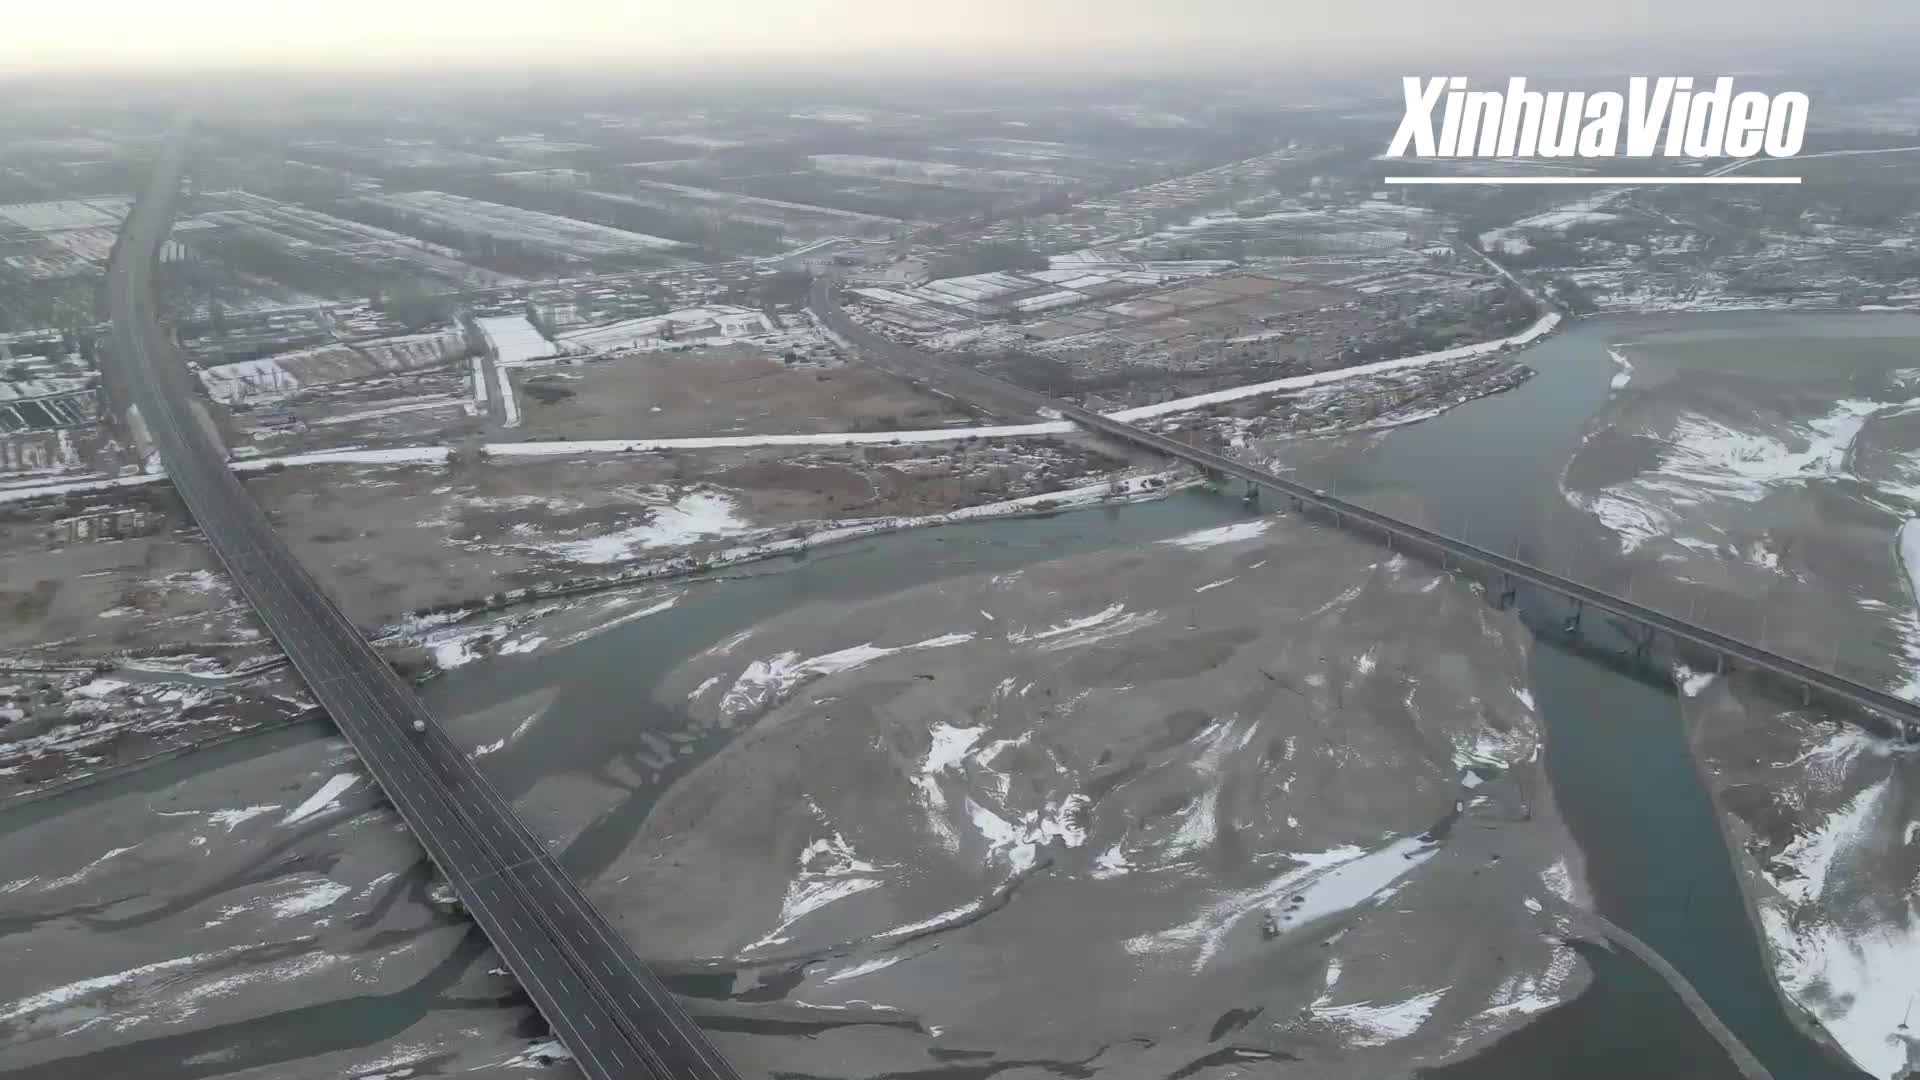 Yarkand River in winter